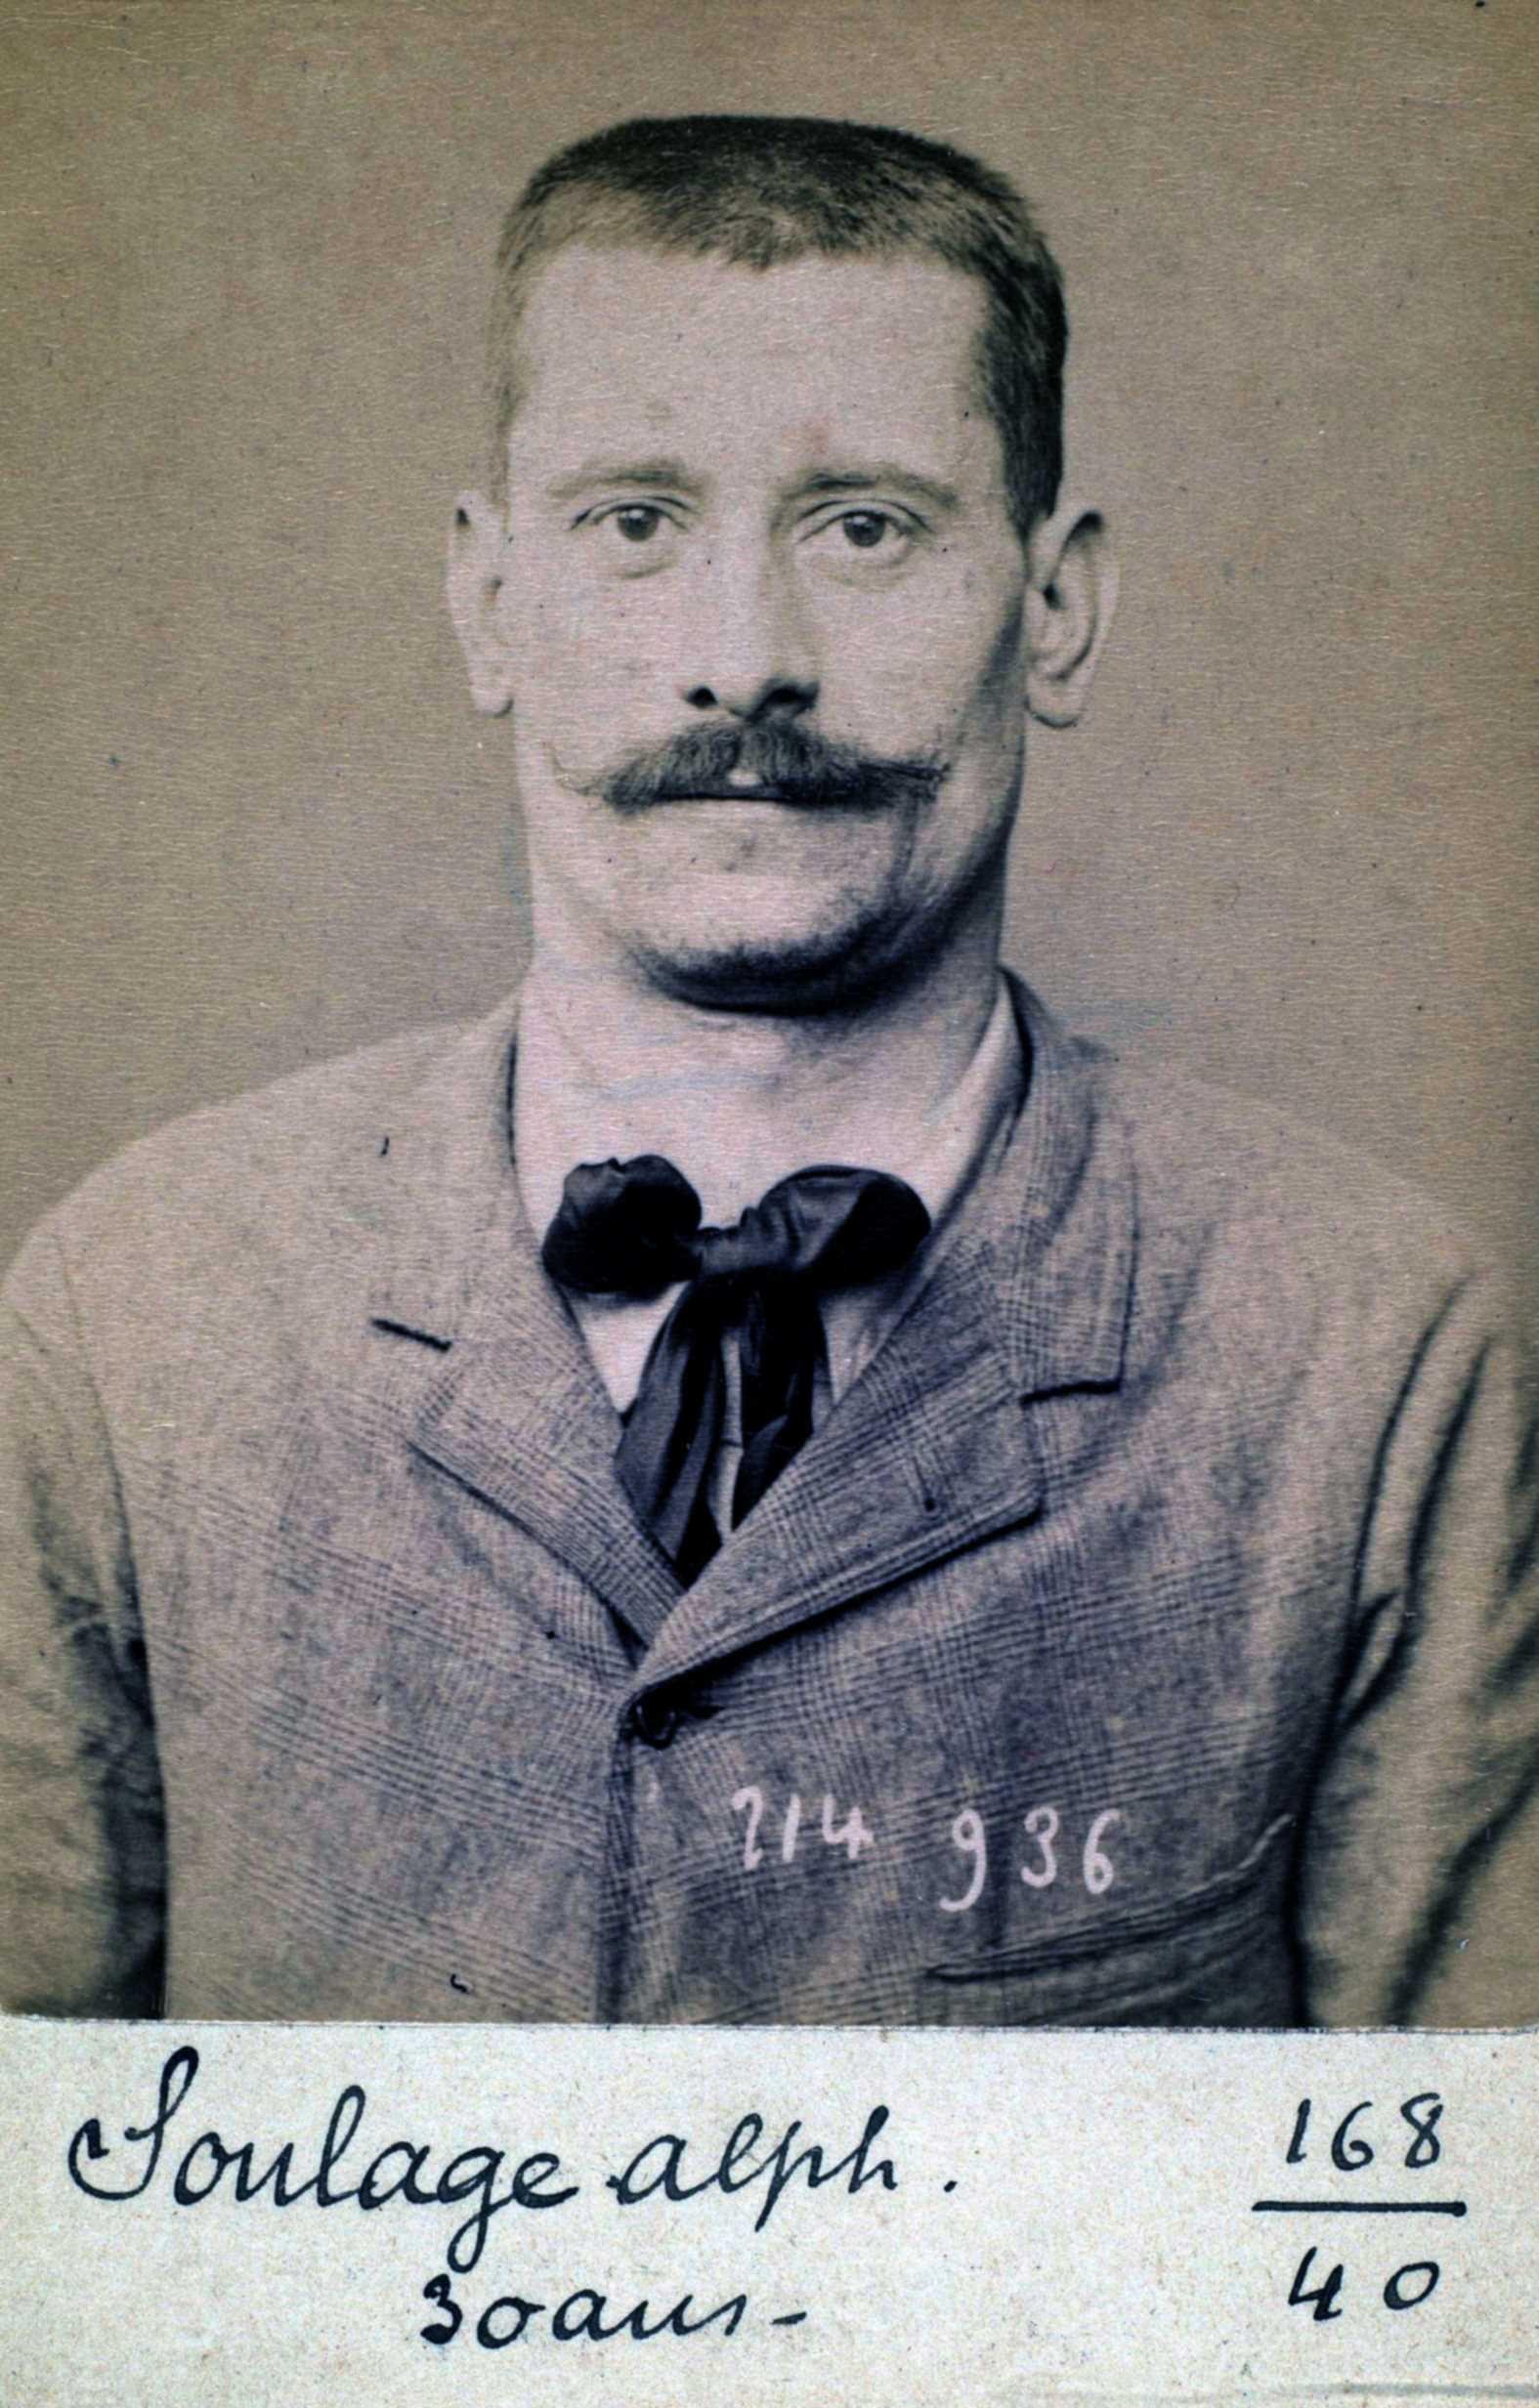 Foto policíaca d'Alphonse-Charles Soulage (1 de març de 1894)